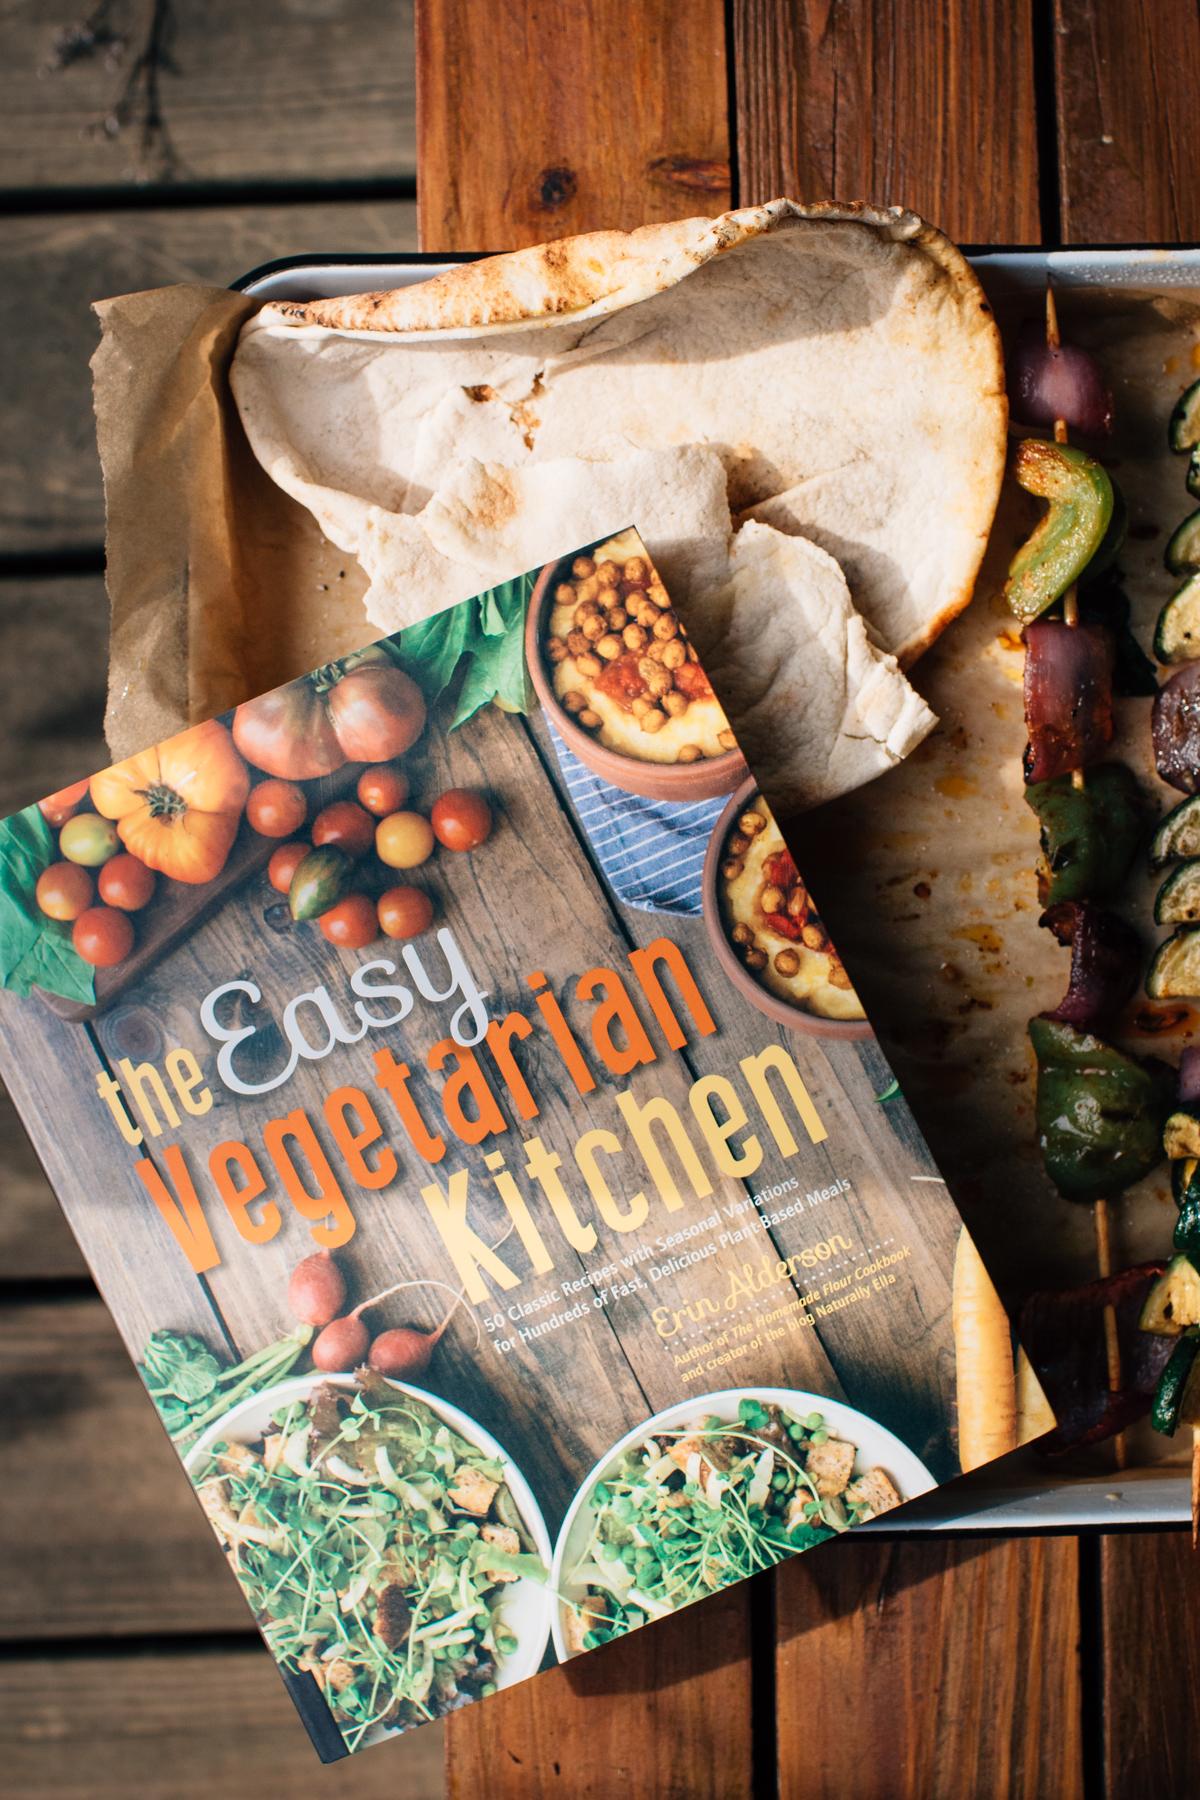 Vegetable Skewers From The Easy Vegetarian Kitchen